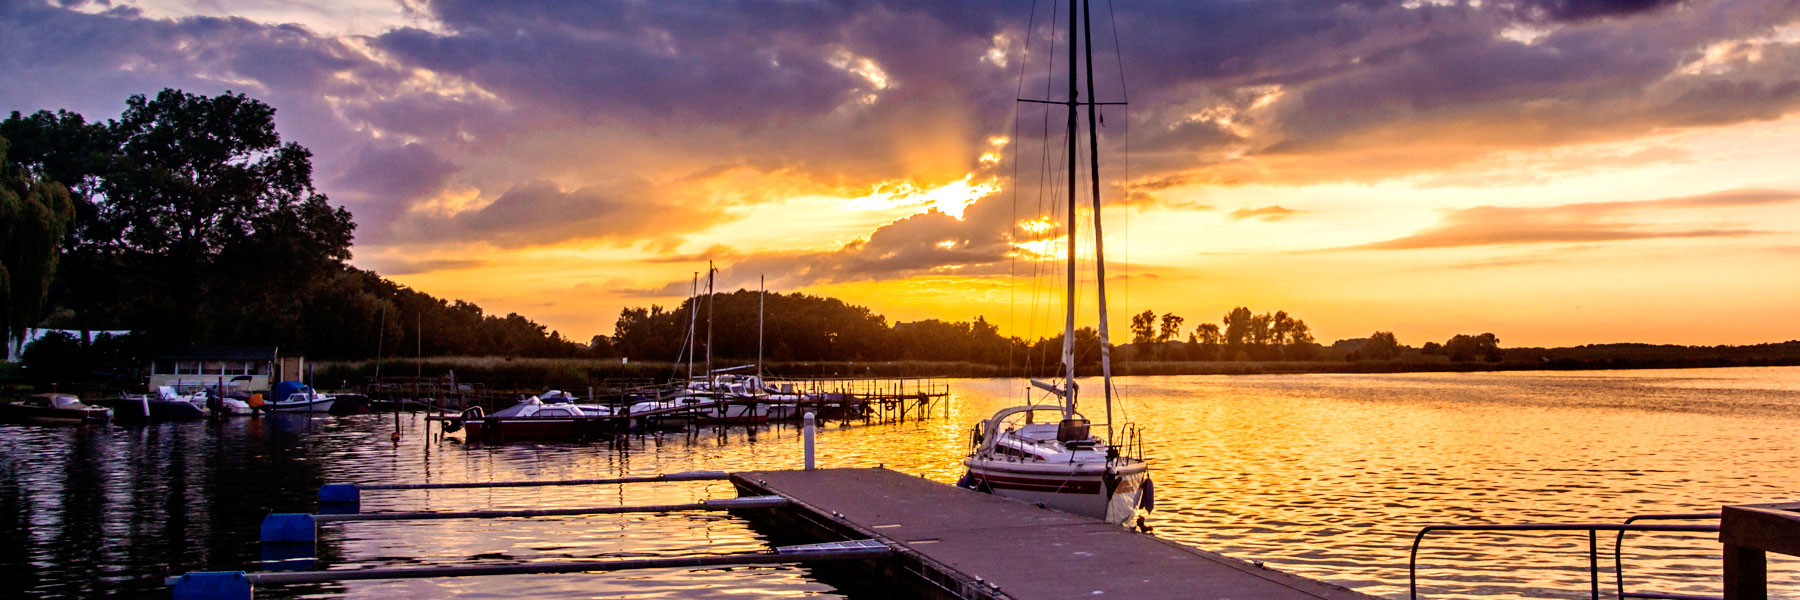 Hafen im Sonnenuntergang - Naturcamping Lassan